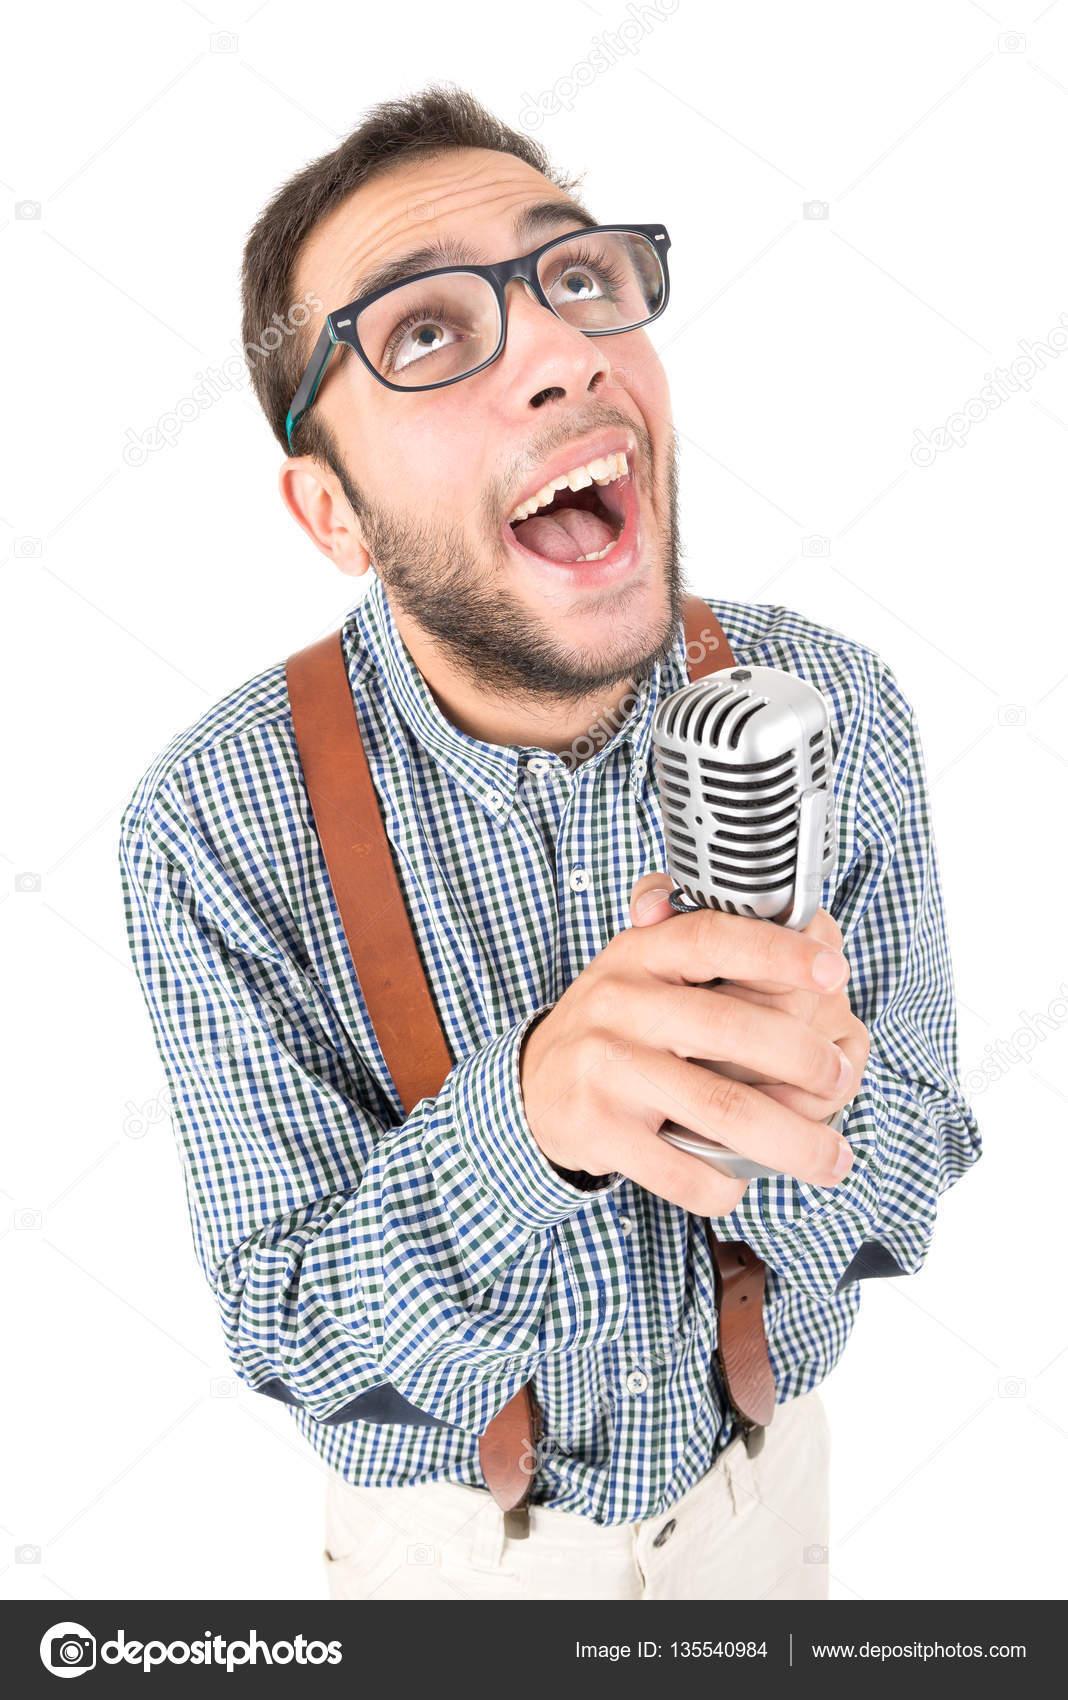 b21df3e114 Nerd που τραγουδά με το μικρόφωνο — Φωτογραφία Αρχείου © luislouro ...